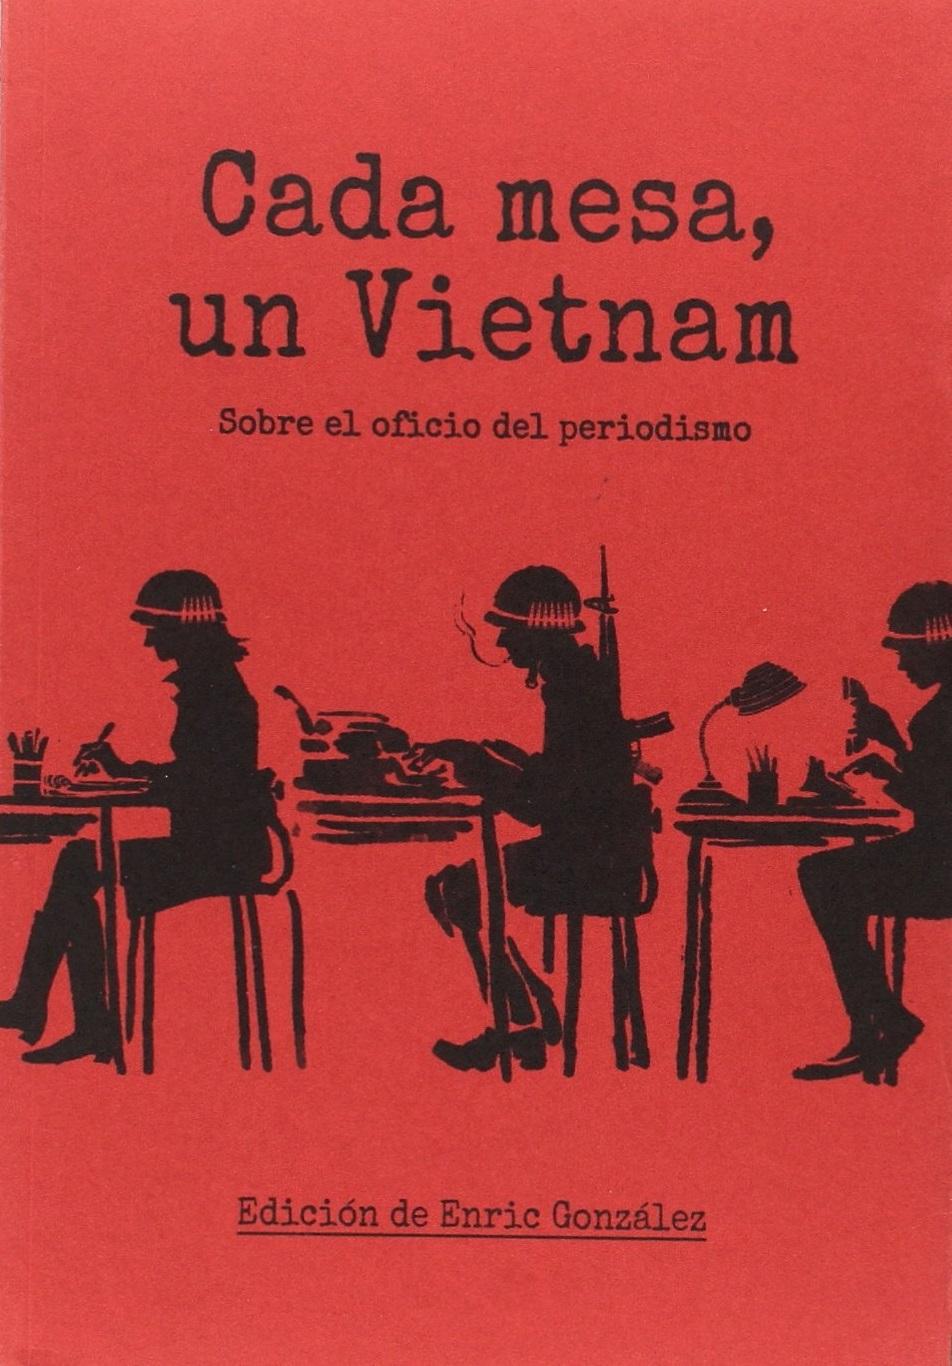 http://laantiguabiblos.blogspot.com/2019/05/cada-mesa-un-vietnam-varios-autores.html